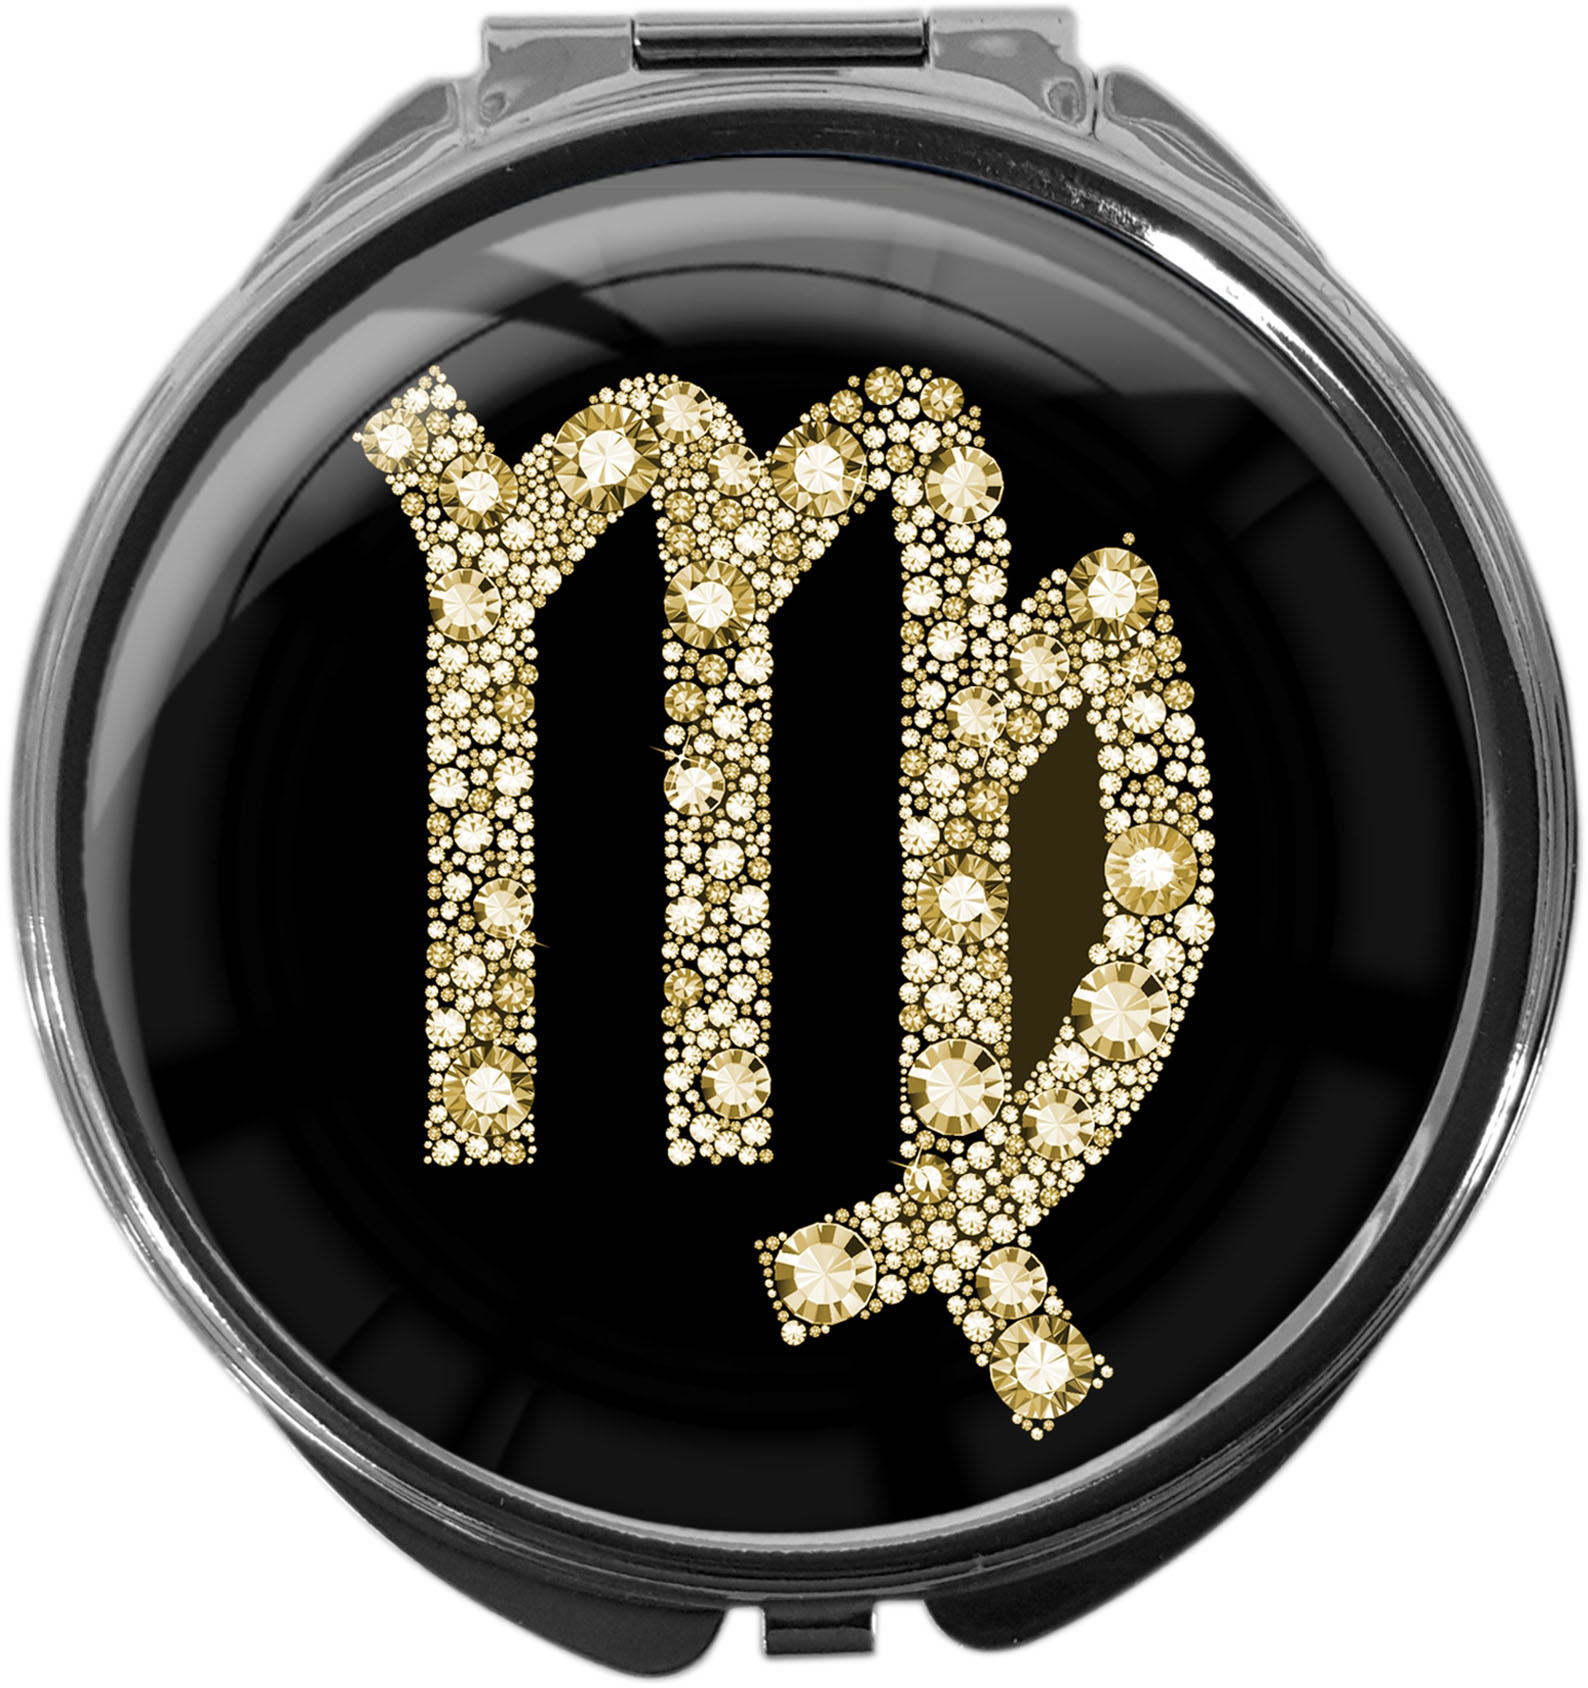 Tablettendose aus Metall | STERNZEICHEN JUNGFRAU | metALUm #00081